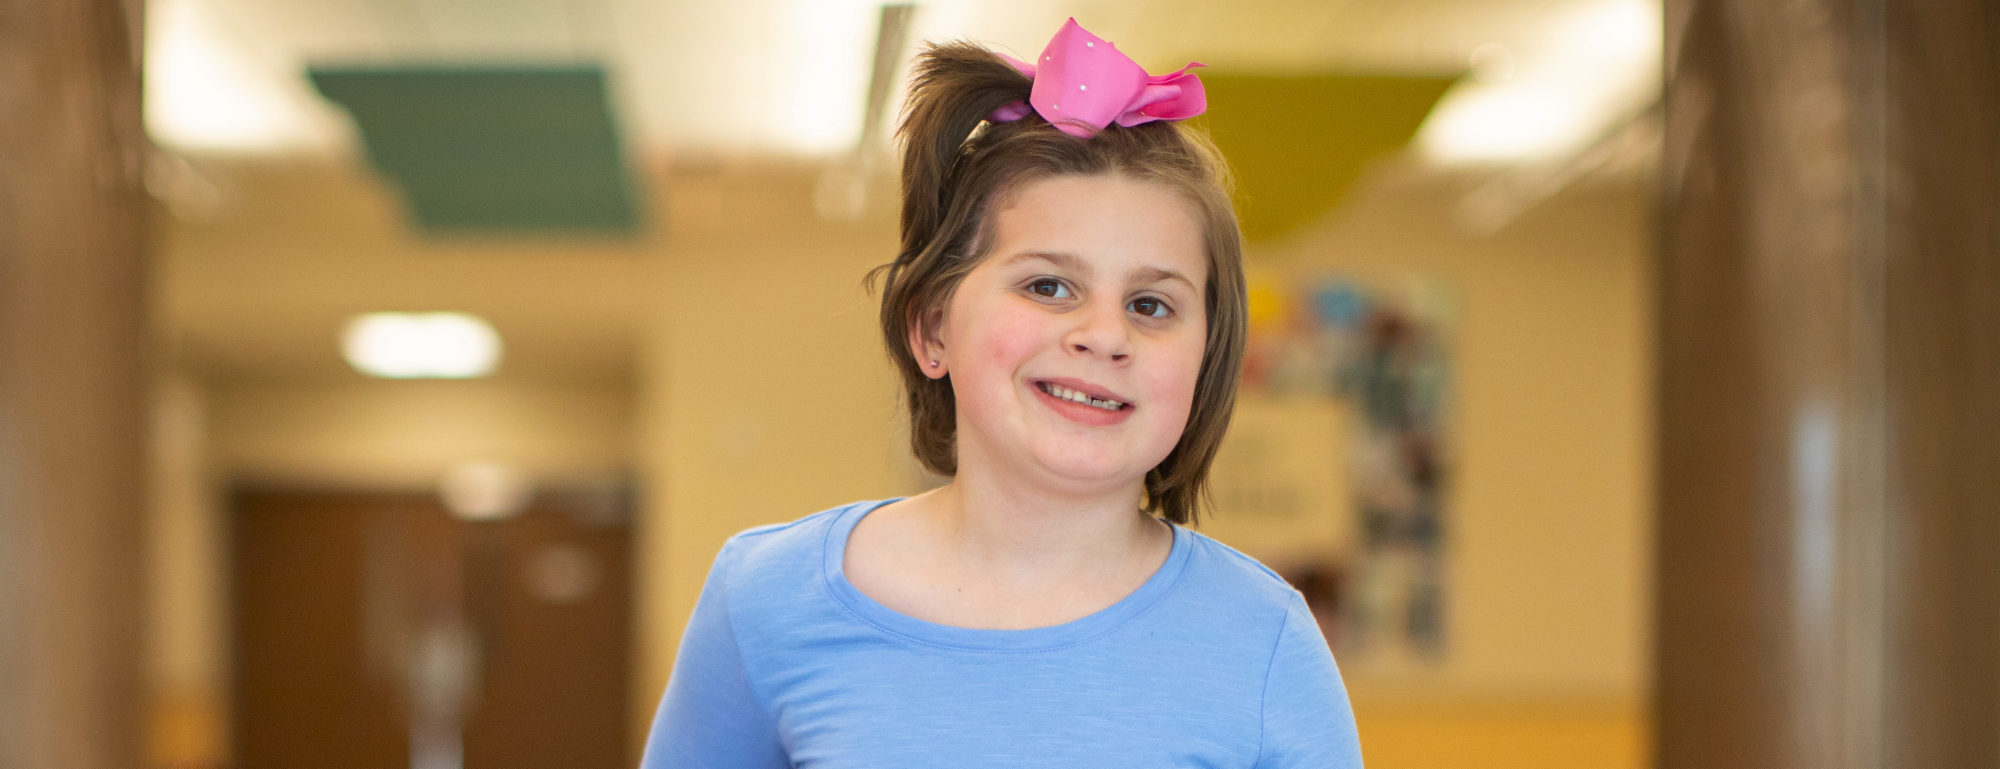 Sophia Had a Stroke Before Her Sixth Birthday